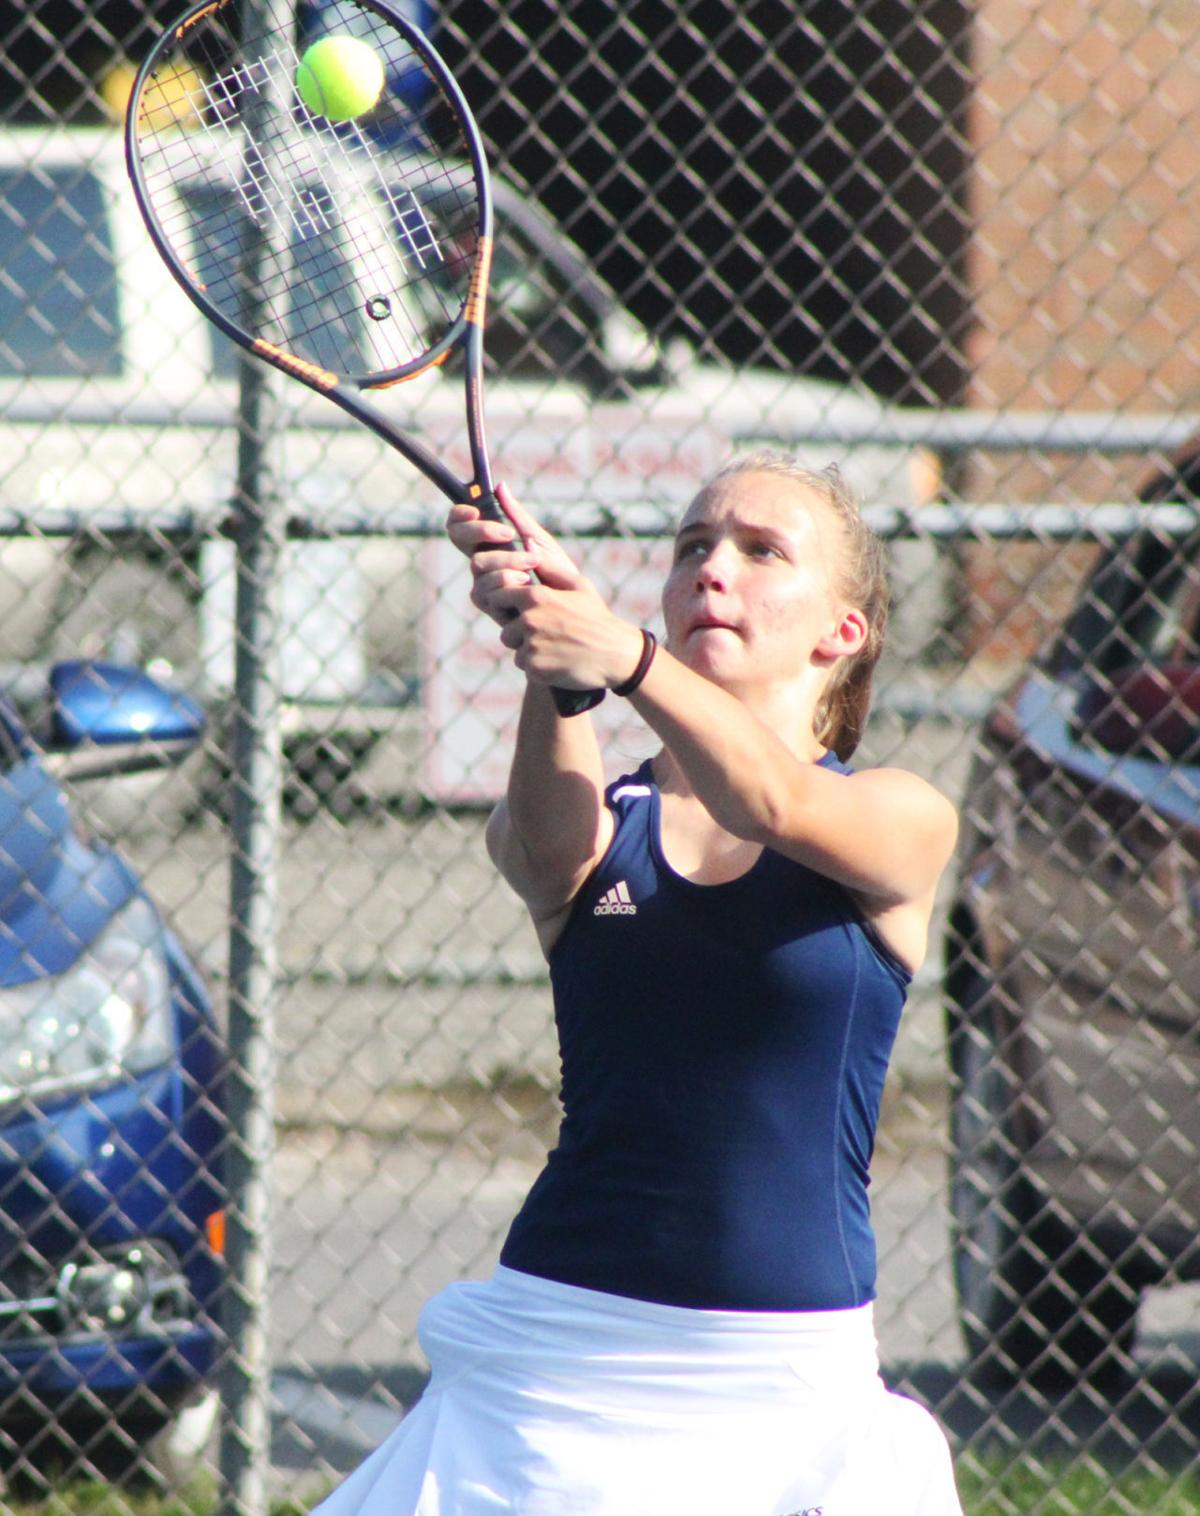 CV tennis player returns the serve